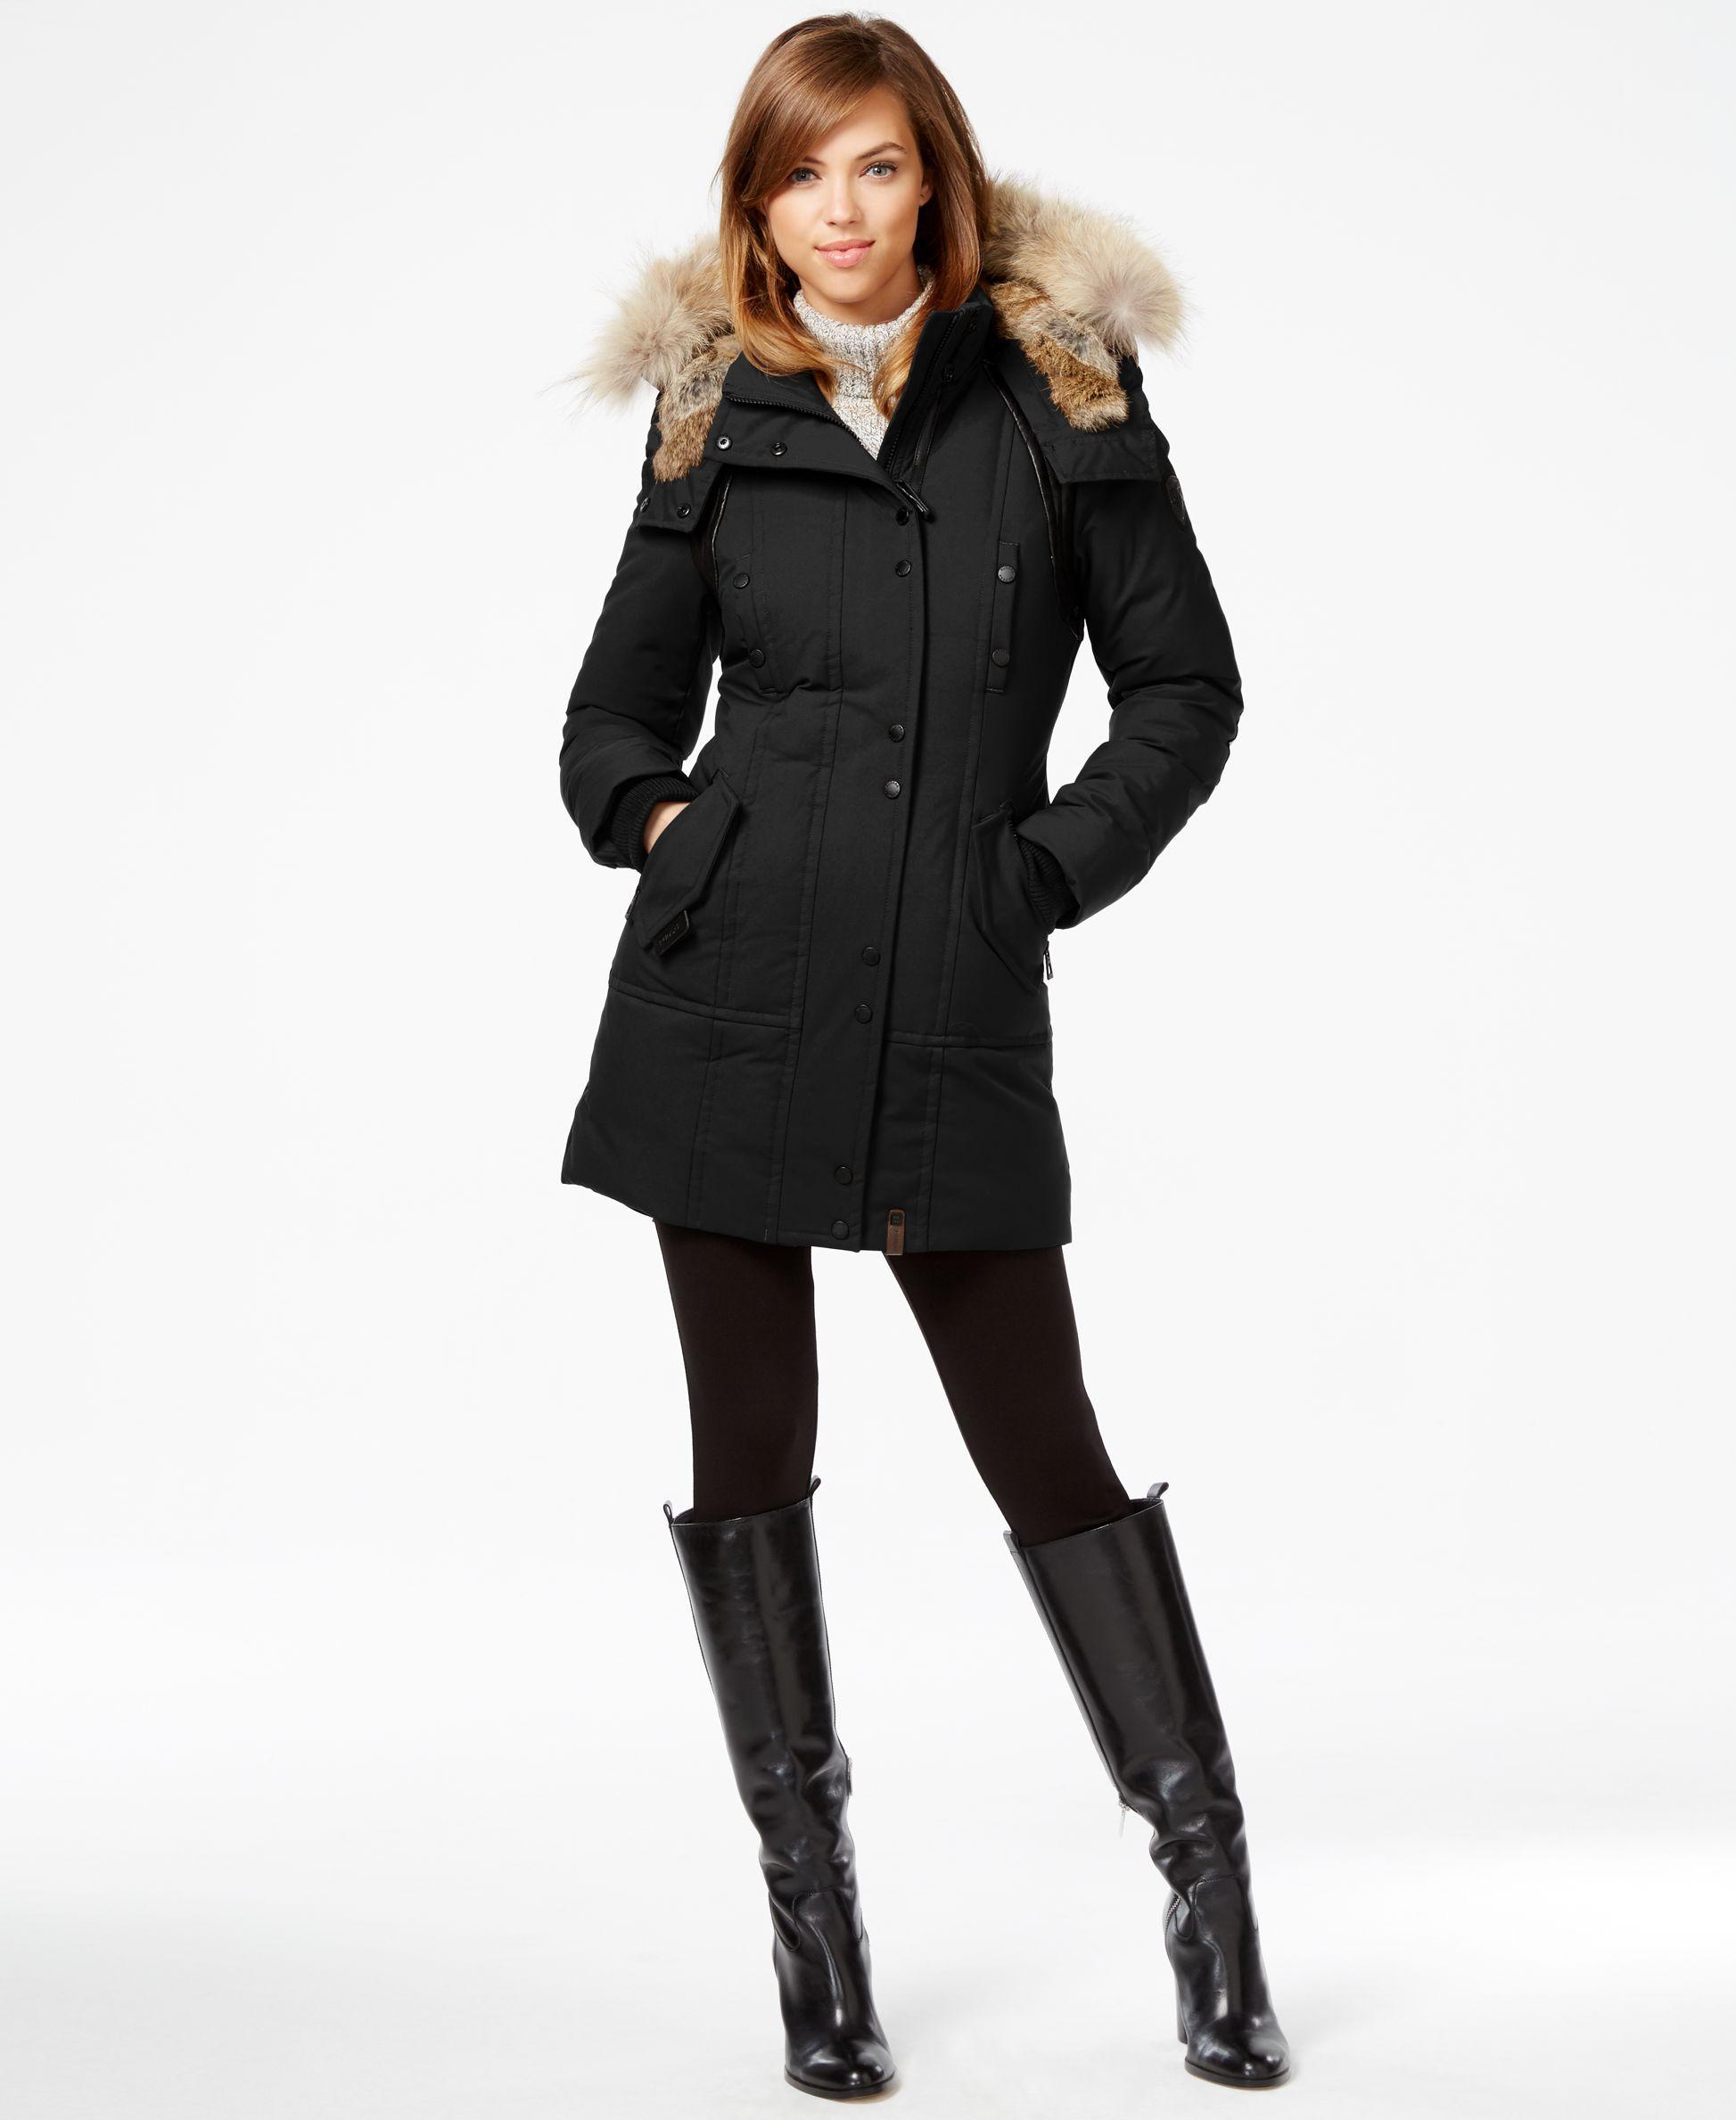 Rudsak Real-Fur-Trim Leather-Trim Coat   fashions   Pinterest ...